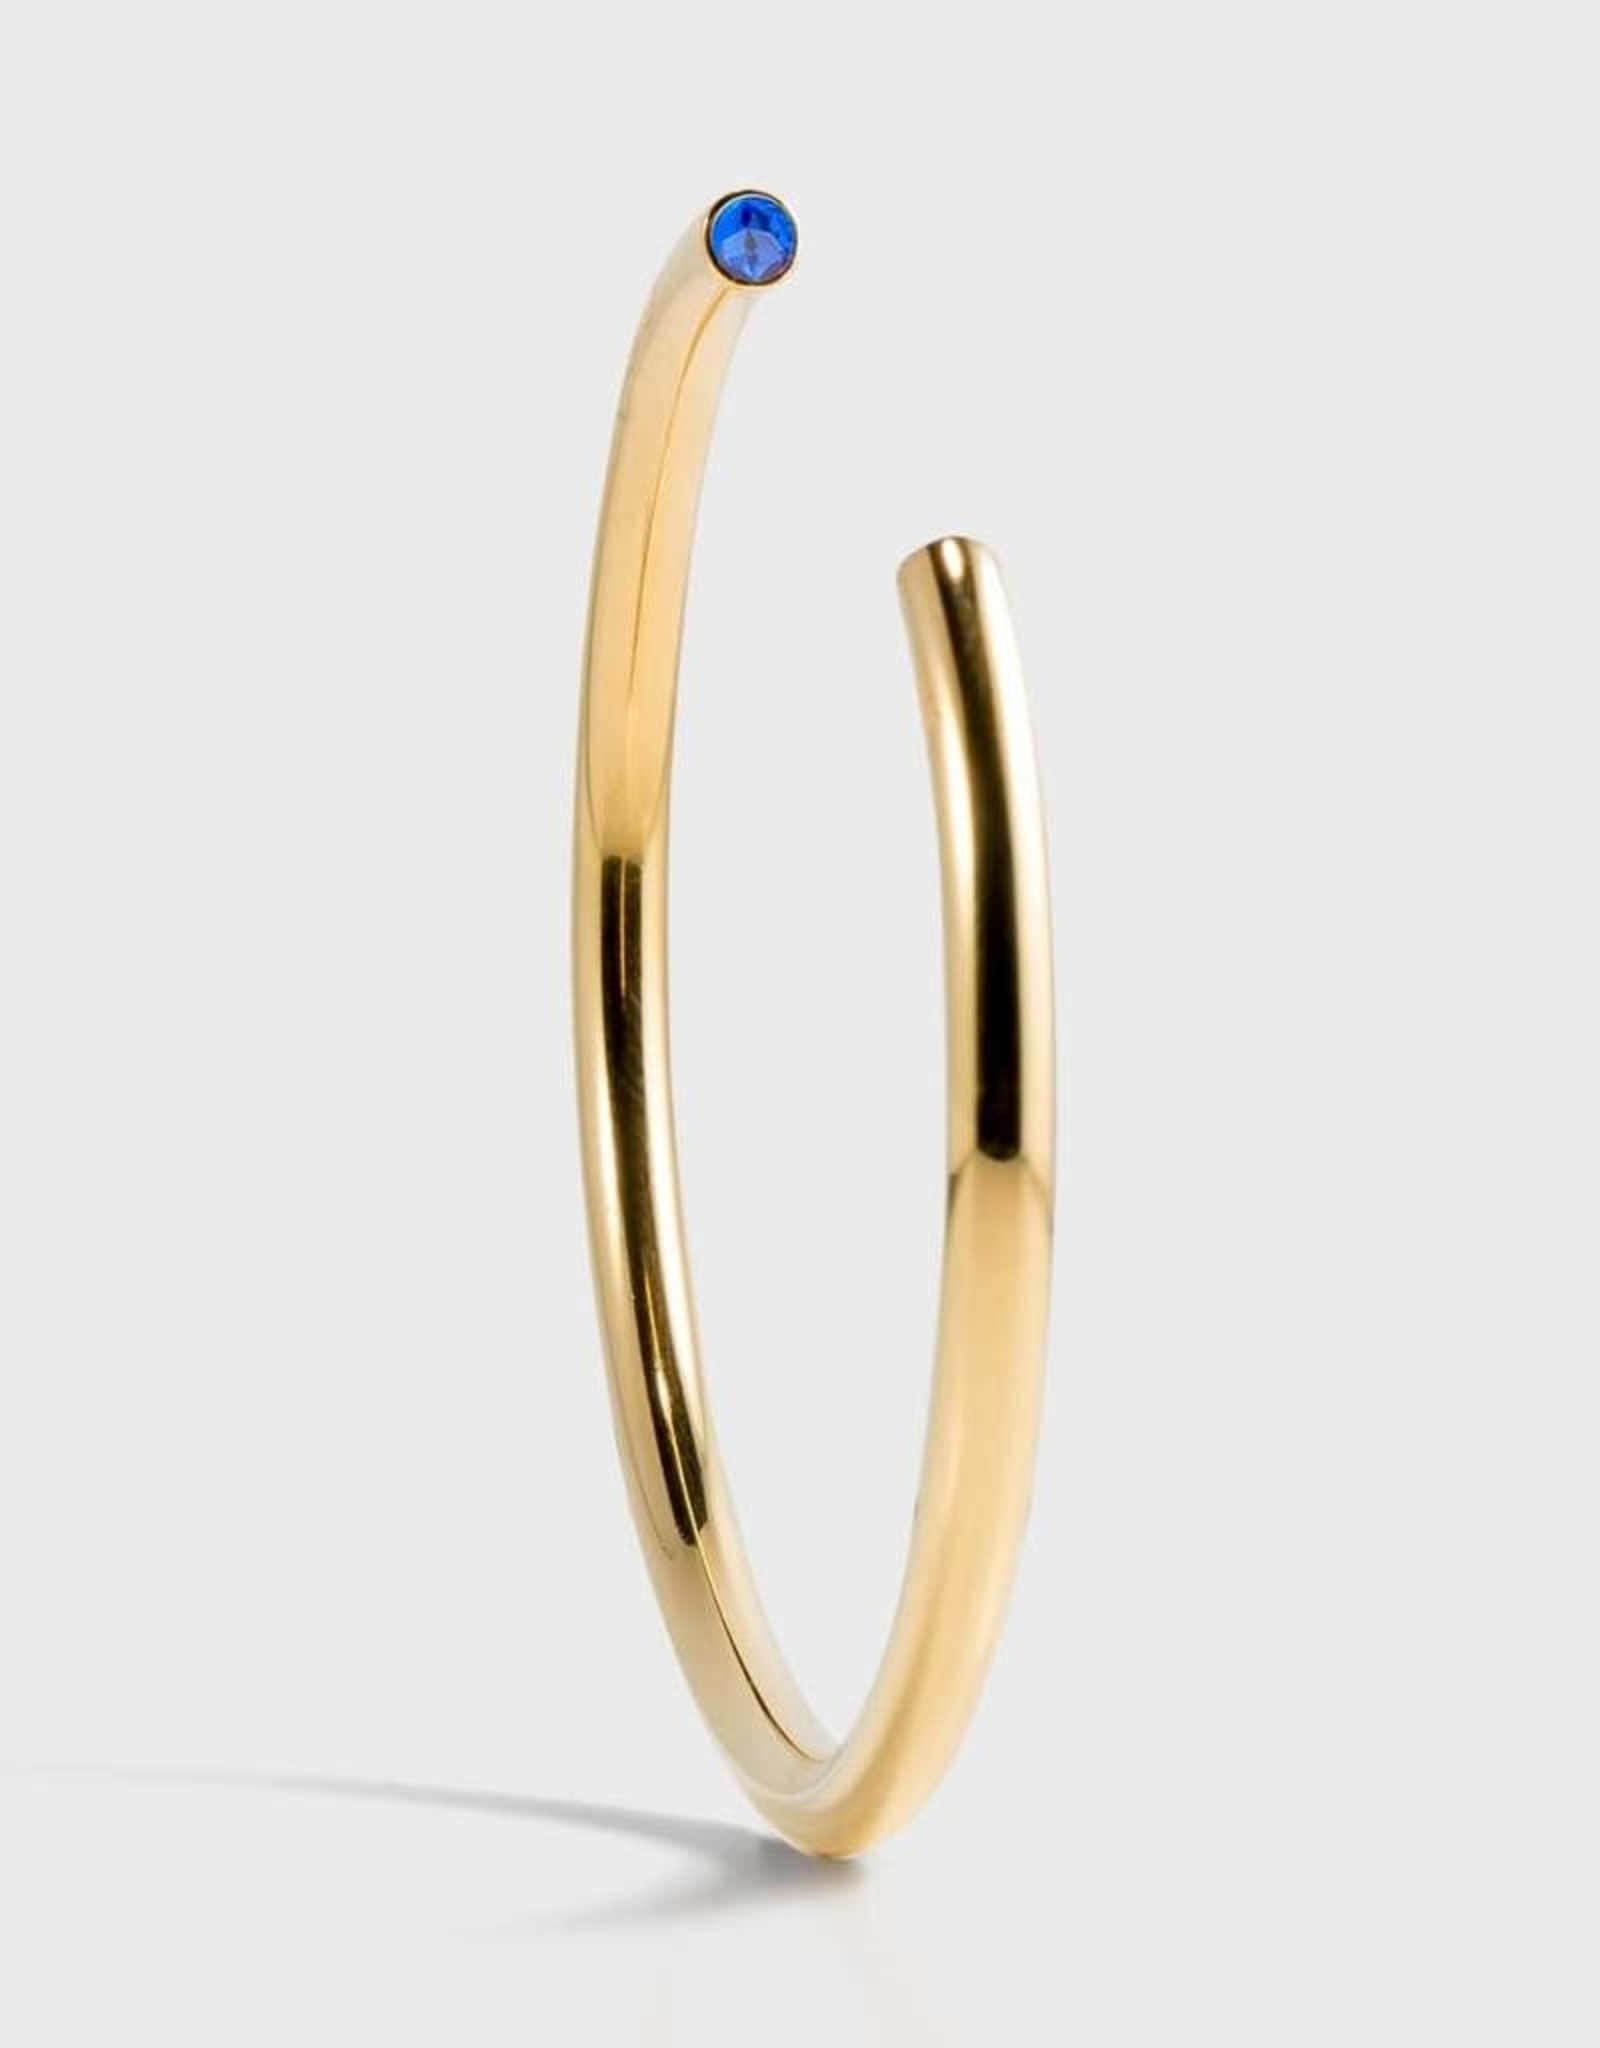 Stella Vale Birthstone Bracelet - September/Gold